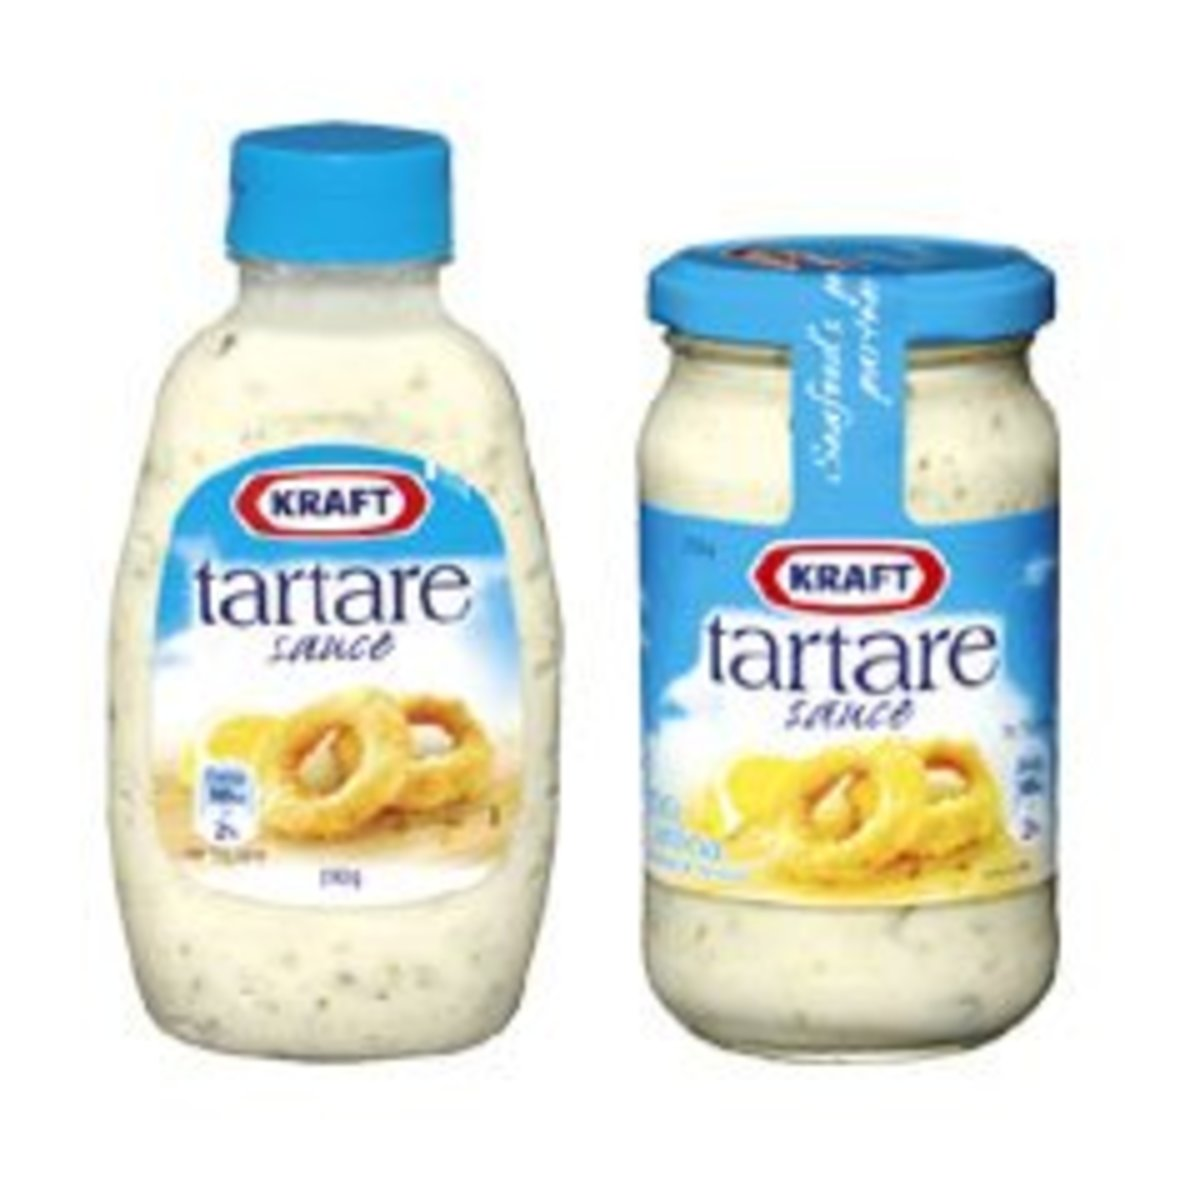 Serve with tartare sauce